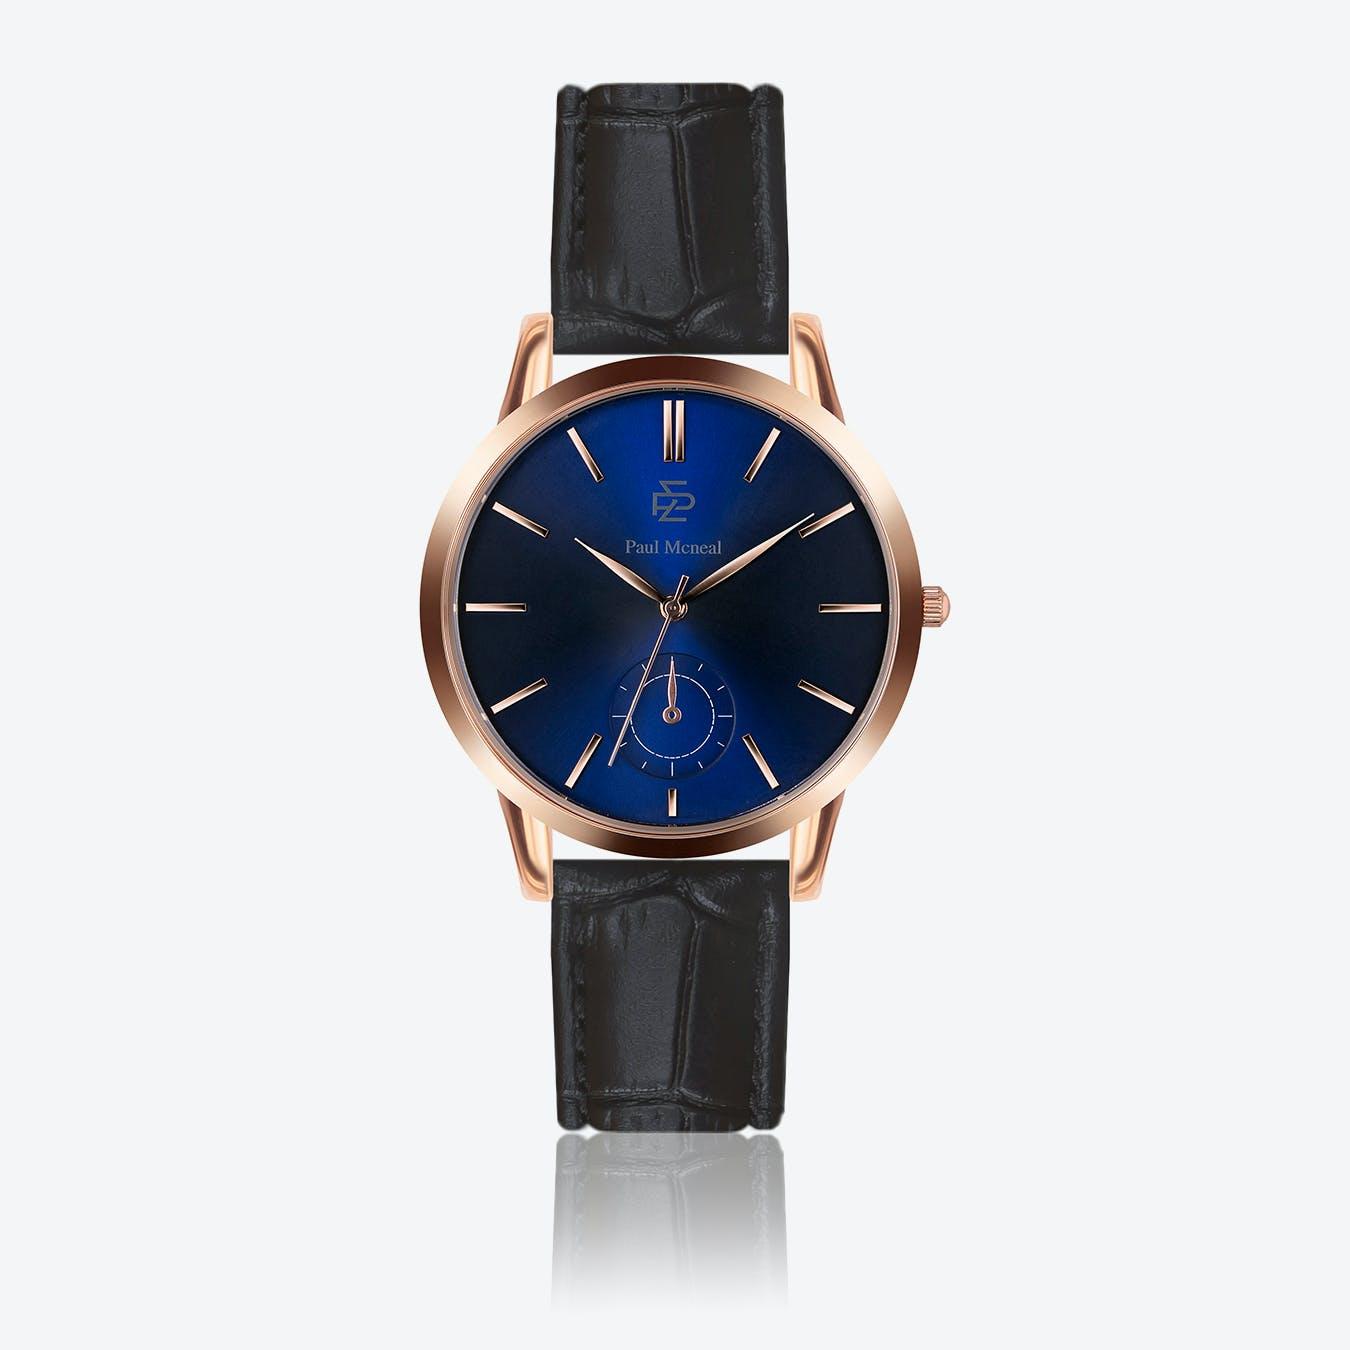 Croco Black Leather Watch w/ Dark Blue Sunray Face - Ø 42 mm